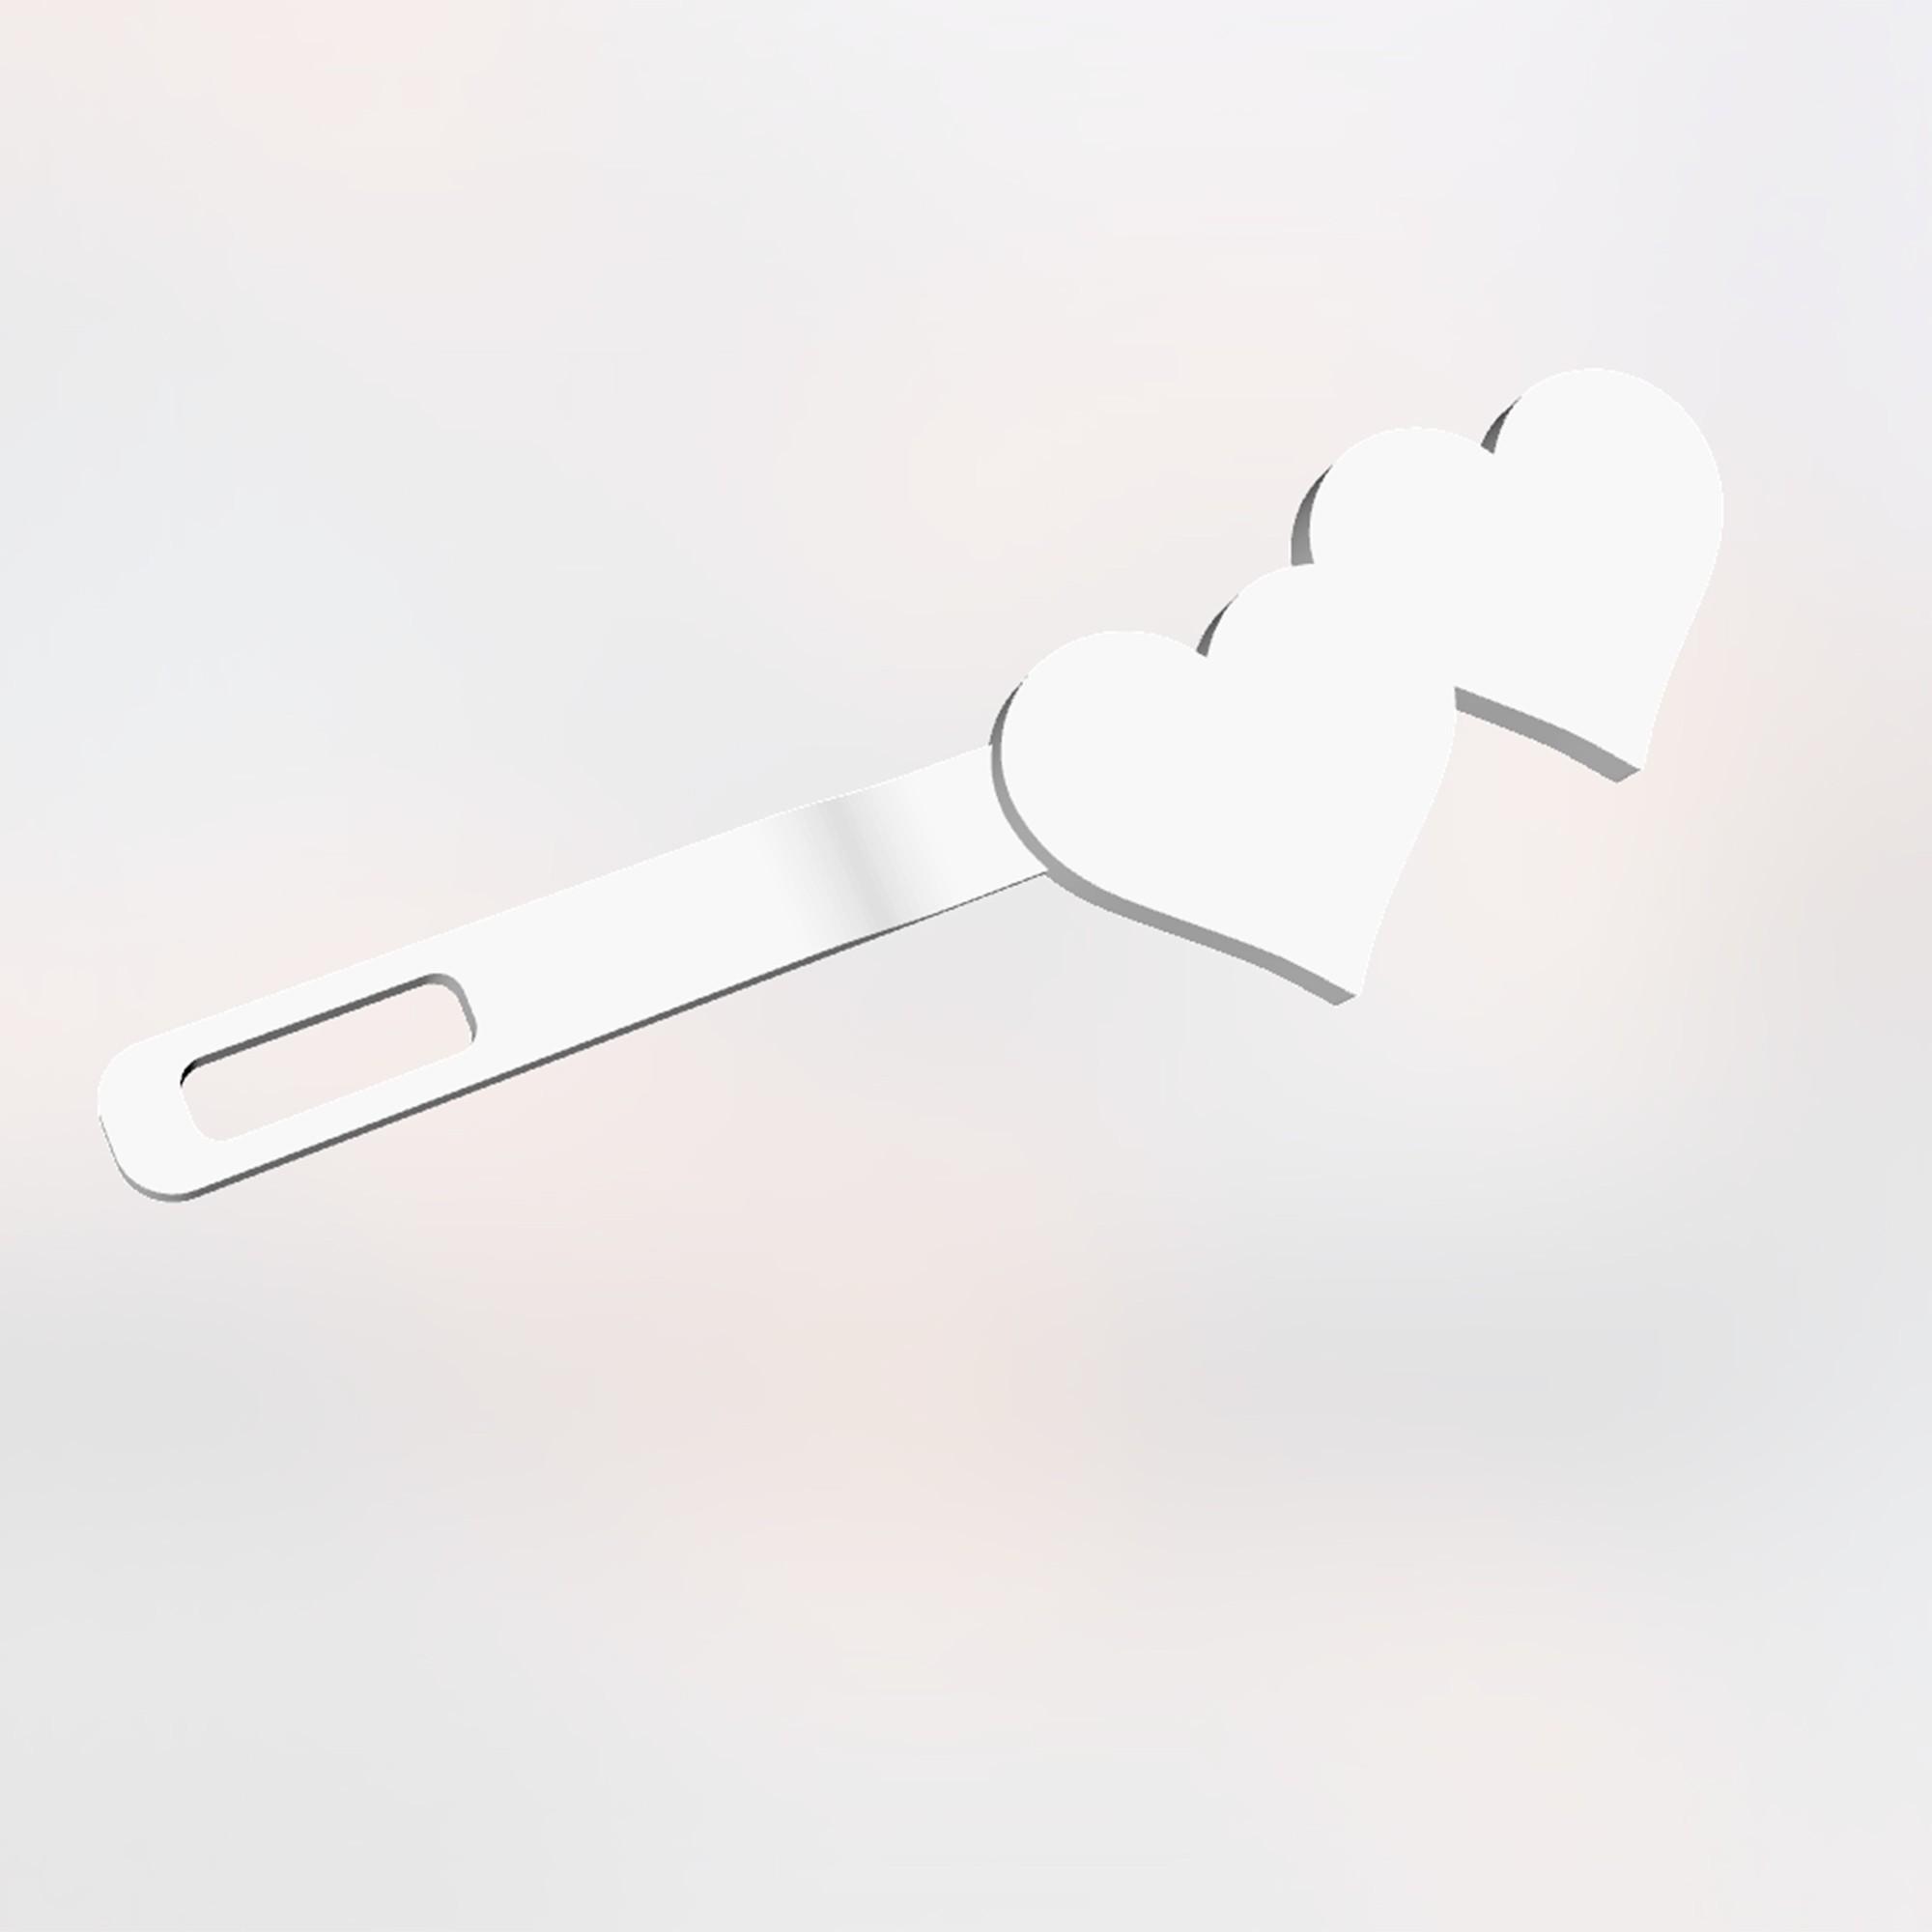 Screen Shot 2017-08-18 at 12.05.00 PM.jpg Download free STL file Two Hearts Hair Clip • 3D print design, delukart